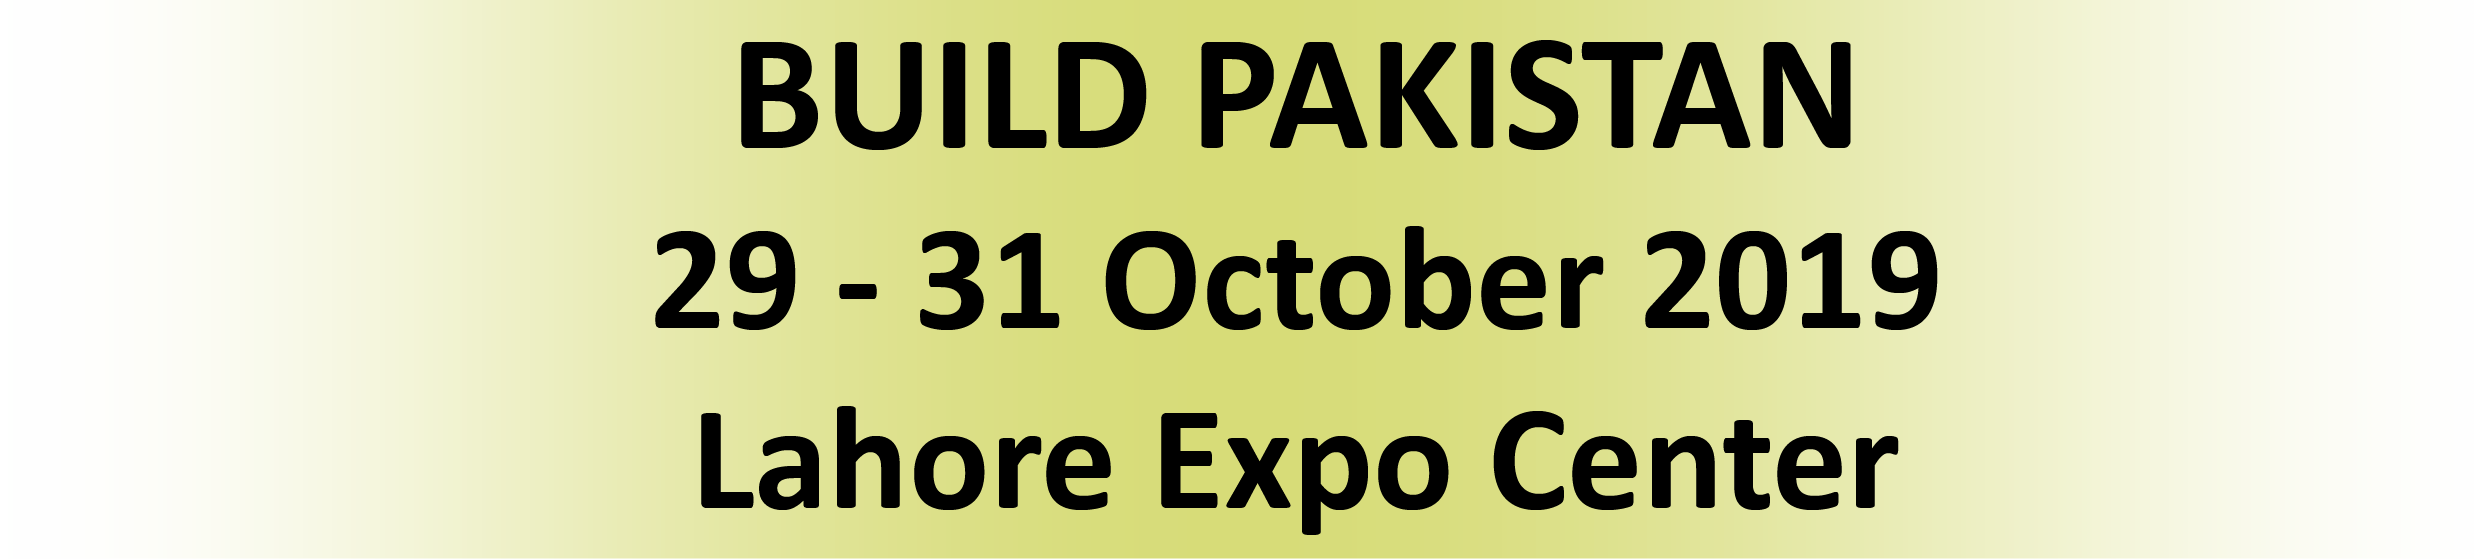 Build Pakistan International Exhibition For Building Construction